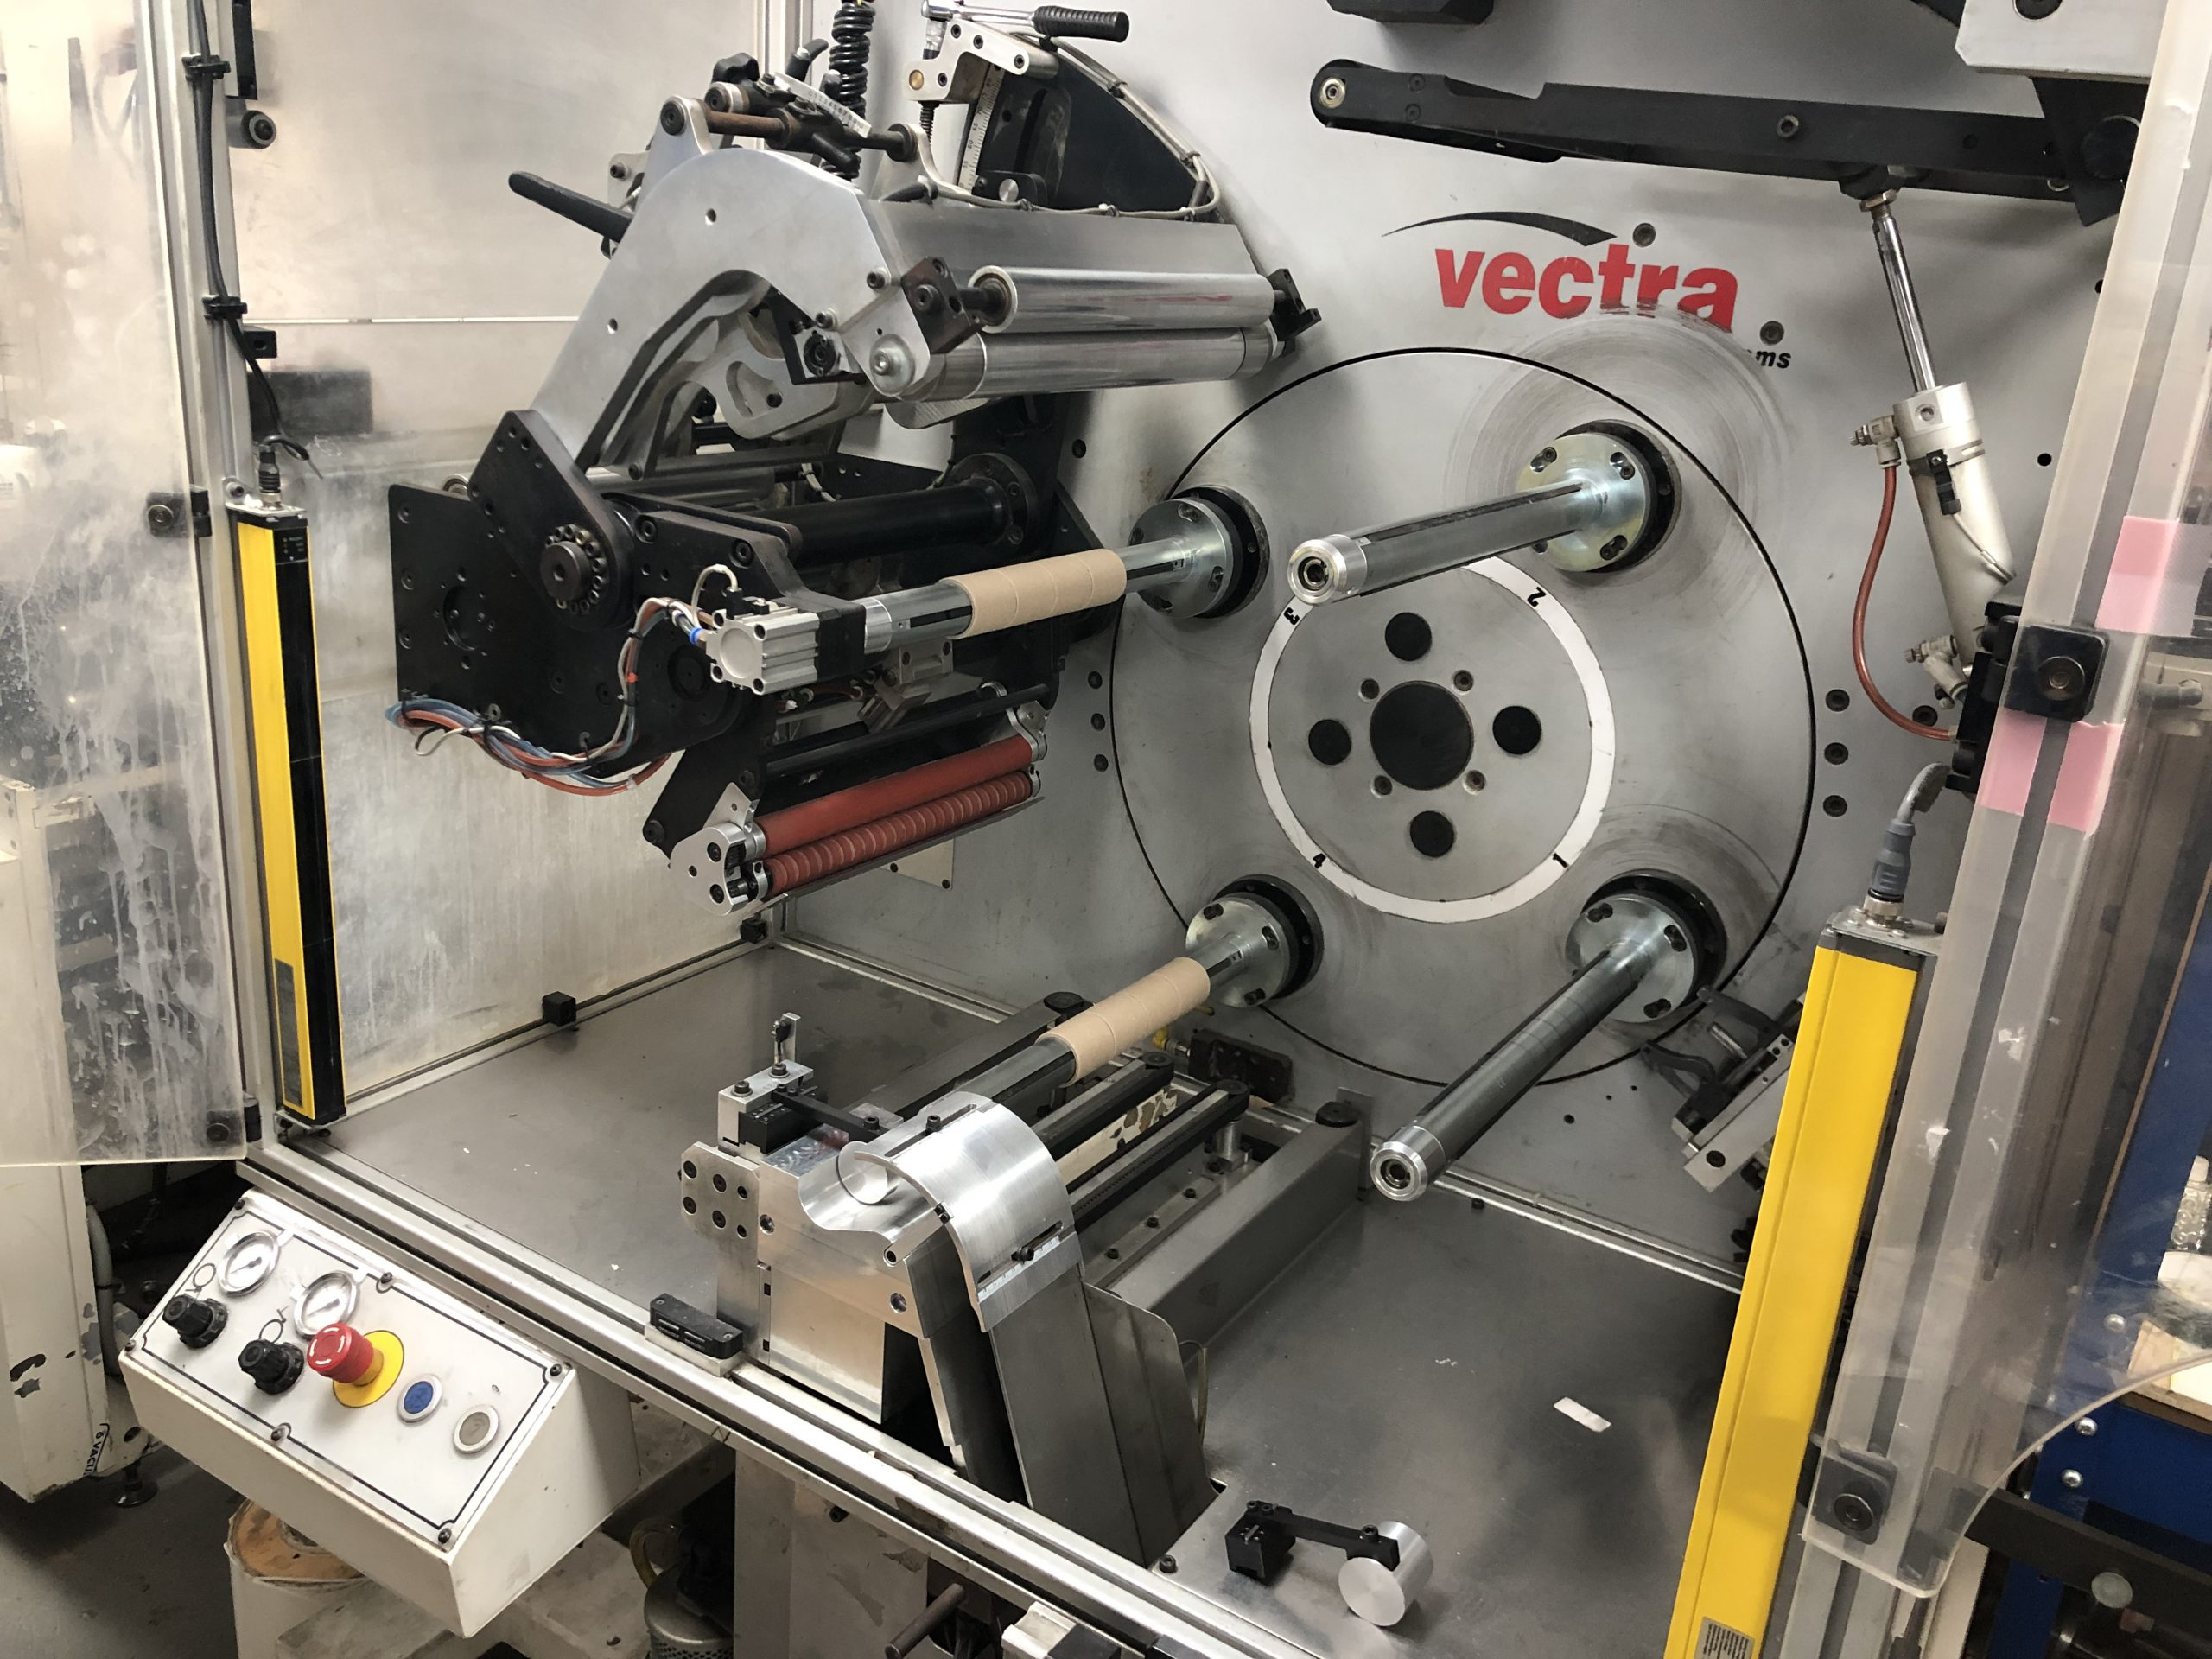 ABG Omega 330 + ABG Vectra SGTR 330 - Used Flexo Printing Presses and Used Flexographic Equipment-8